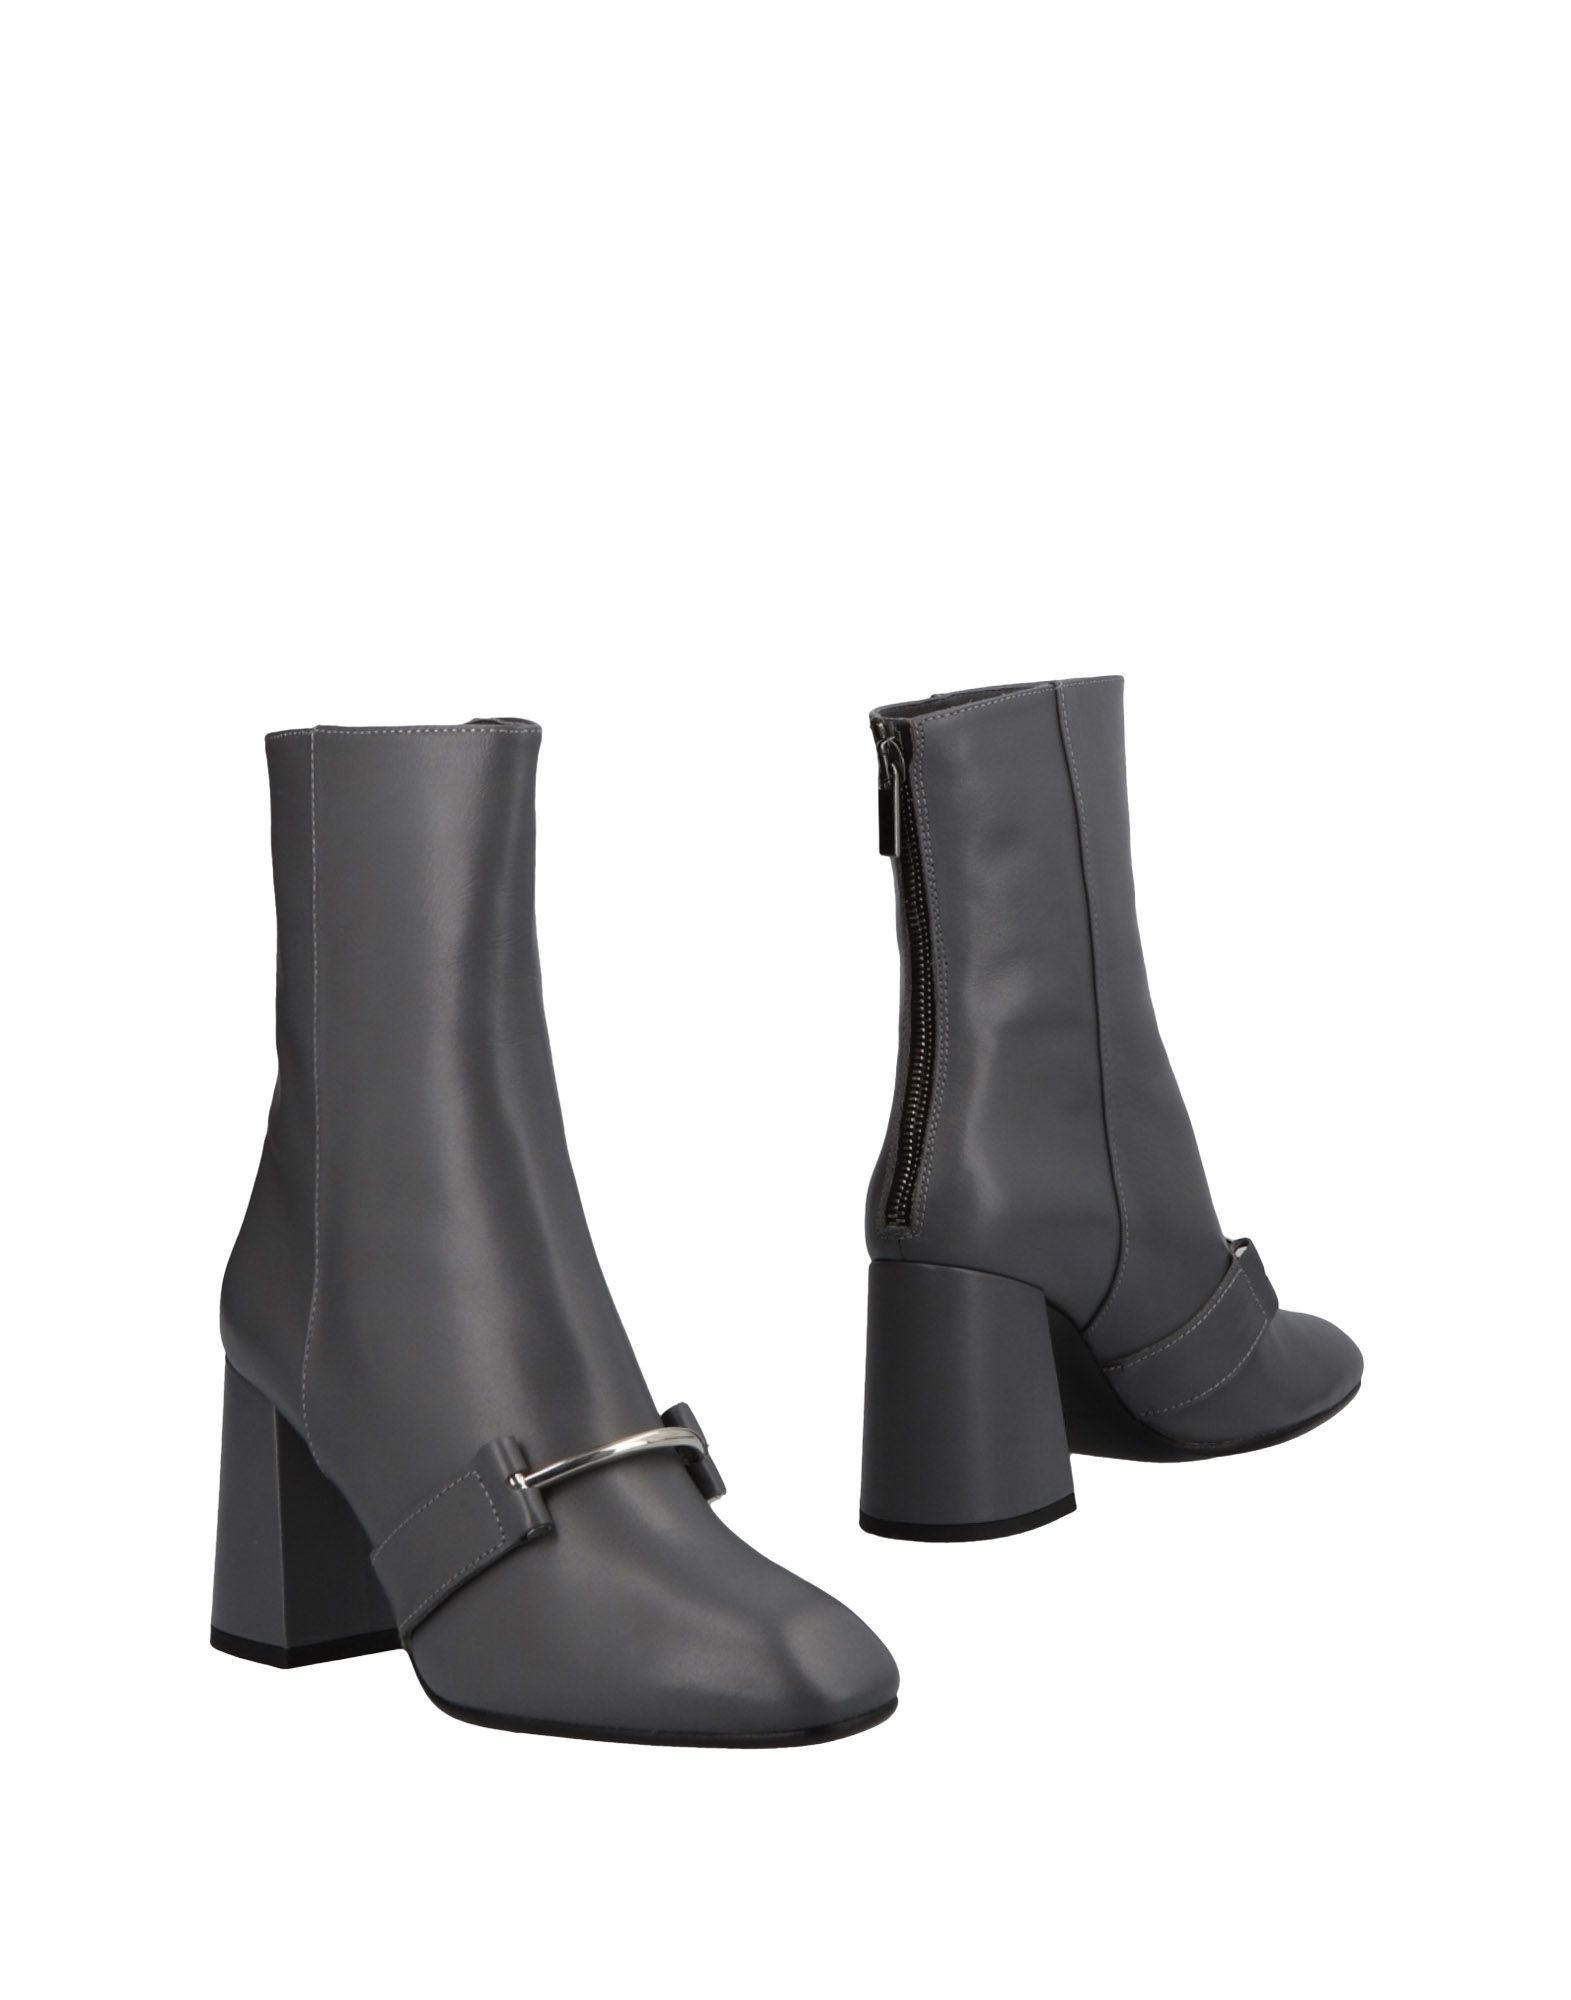 ANGELA CHIARA VENEZIA Ankle Boot in Grey